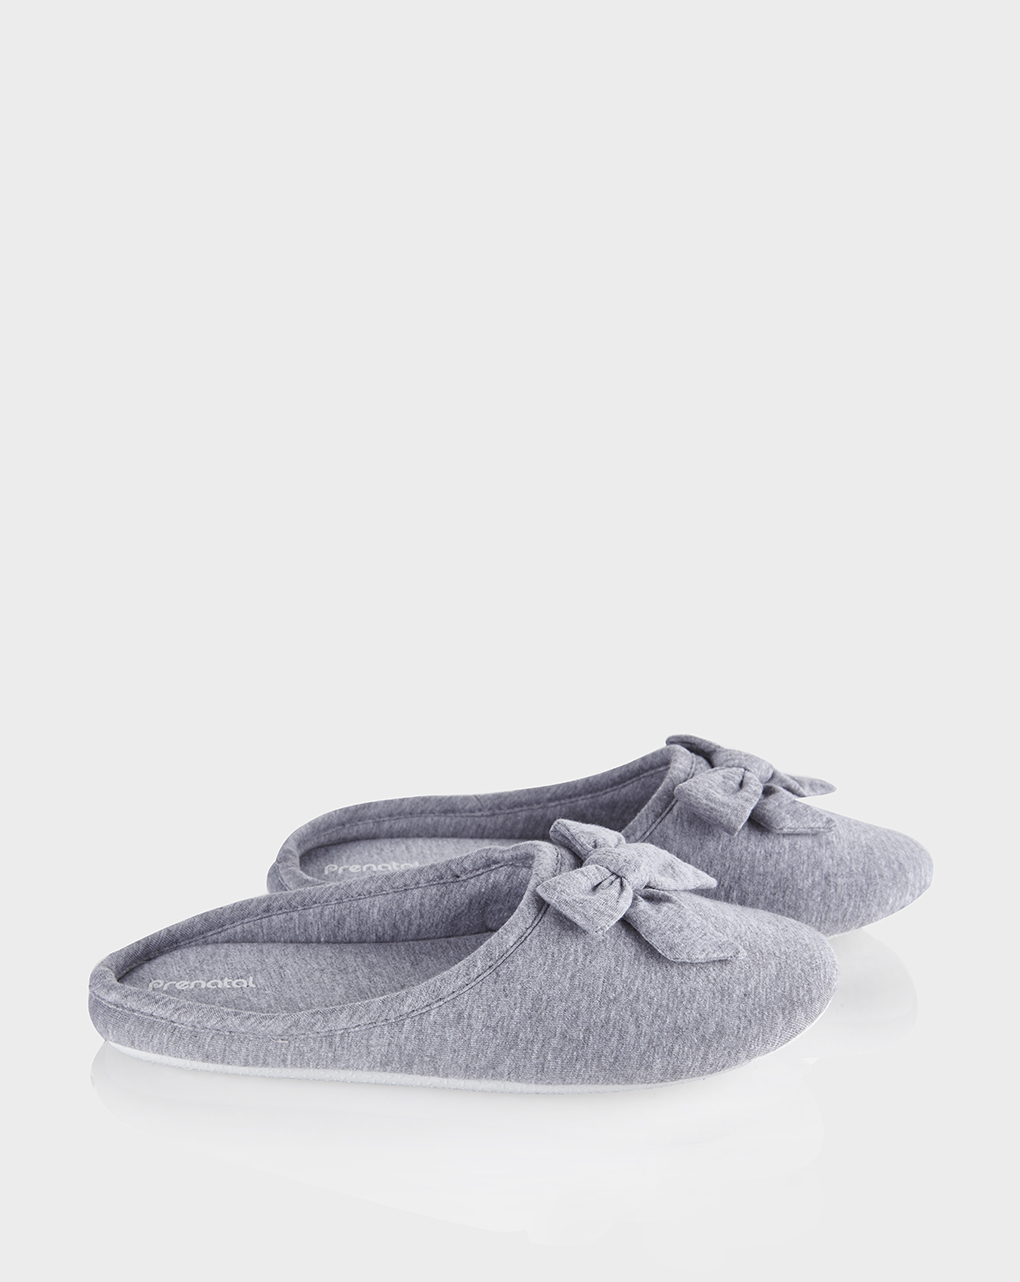 Pantofole chiuse con fiocco donna